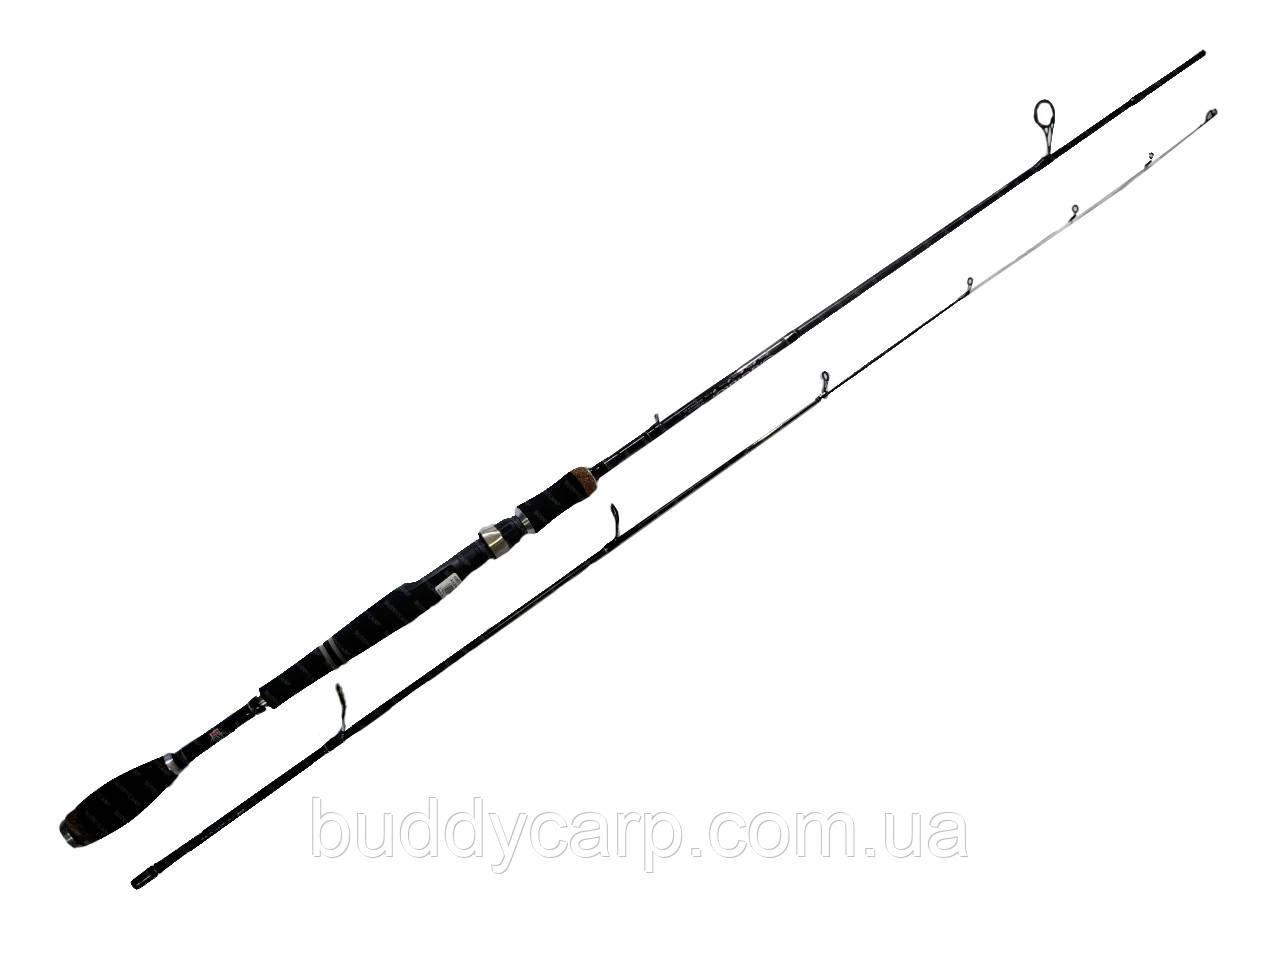 Спиннинг карбоновый SWD Gladiator 0-6 гр. 1.7 метра